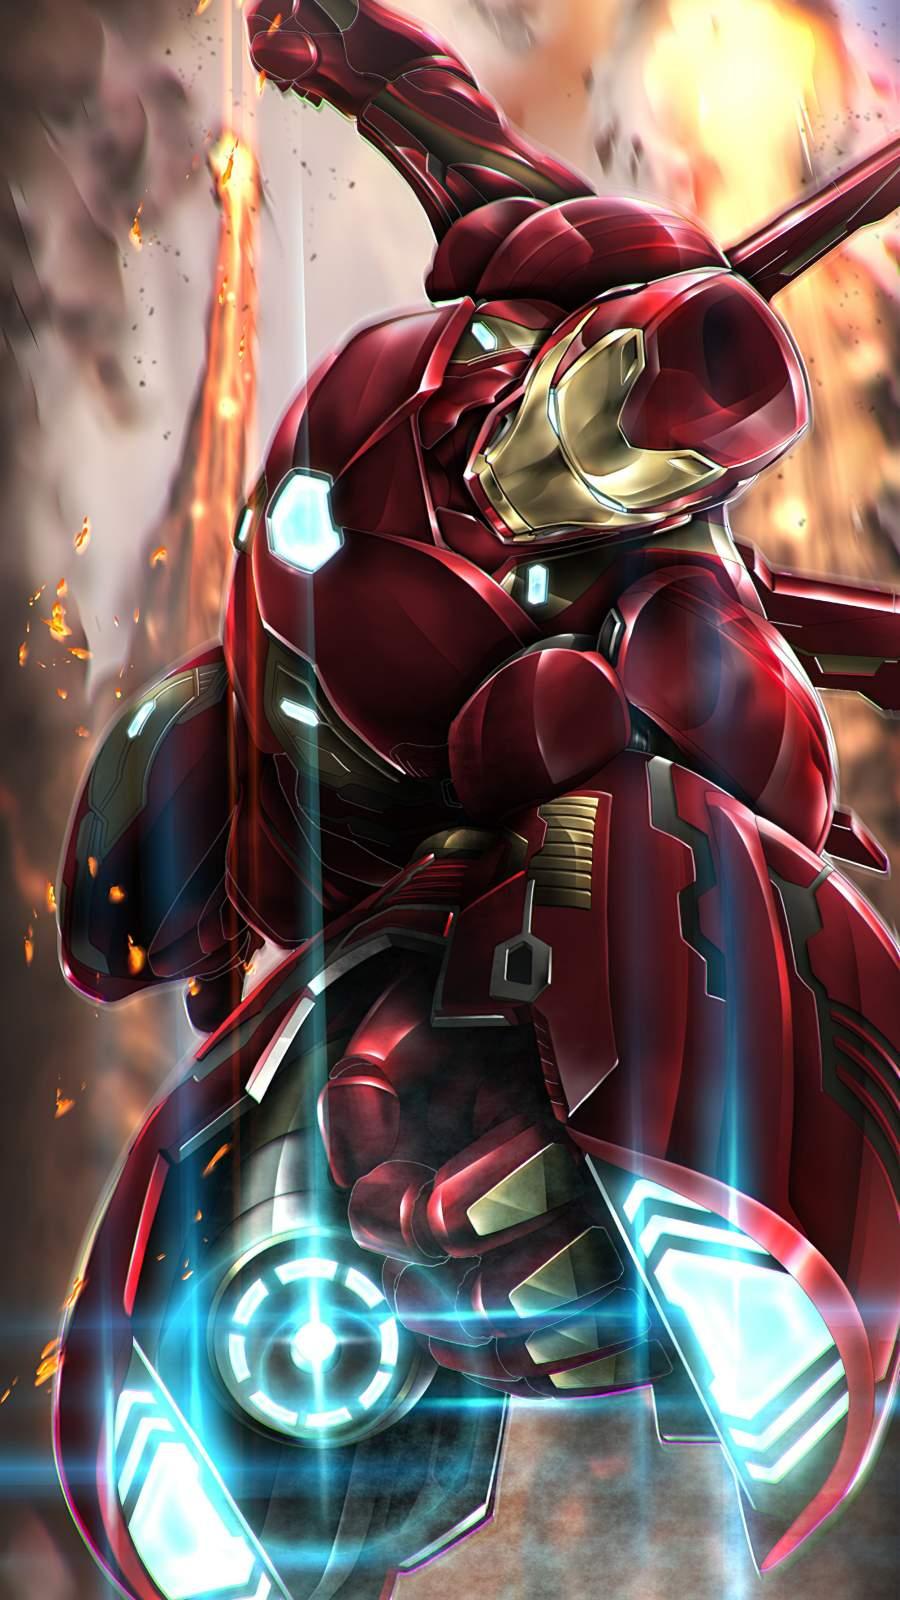 Iron Man Weapon iPhone Wallpaper